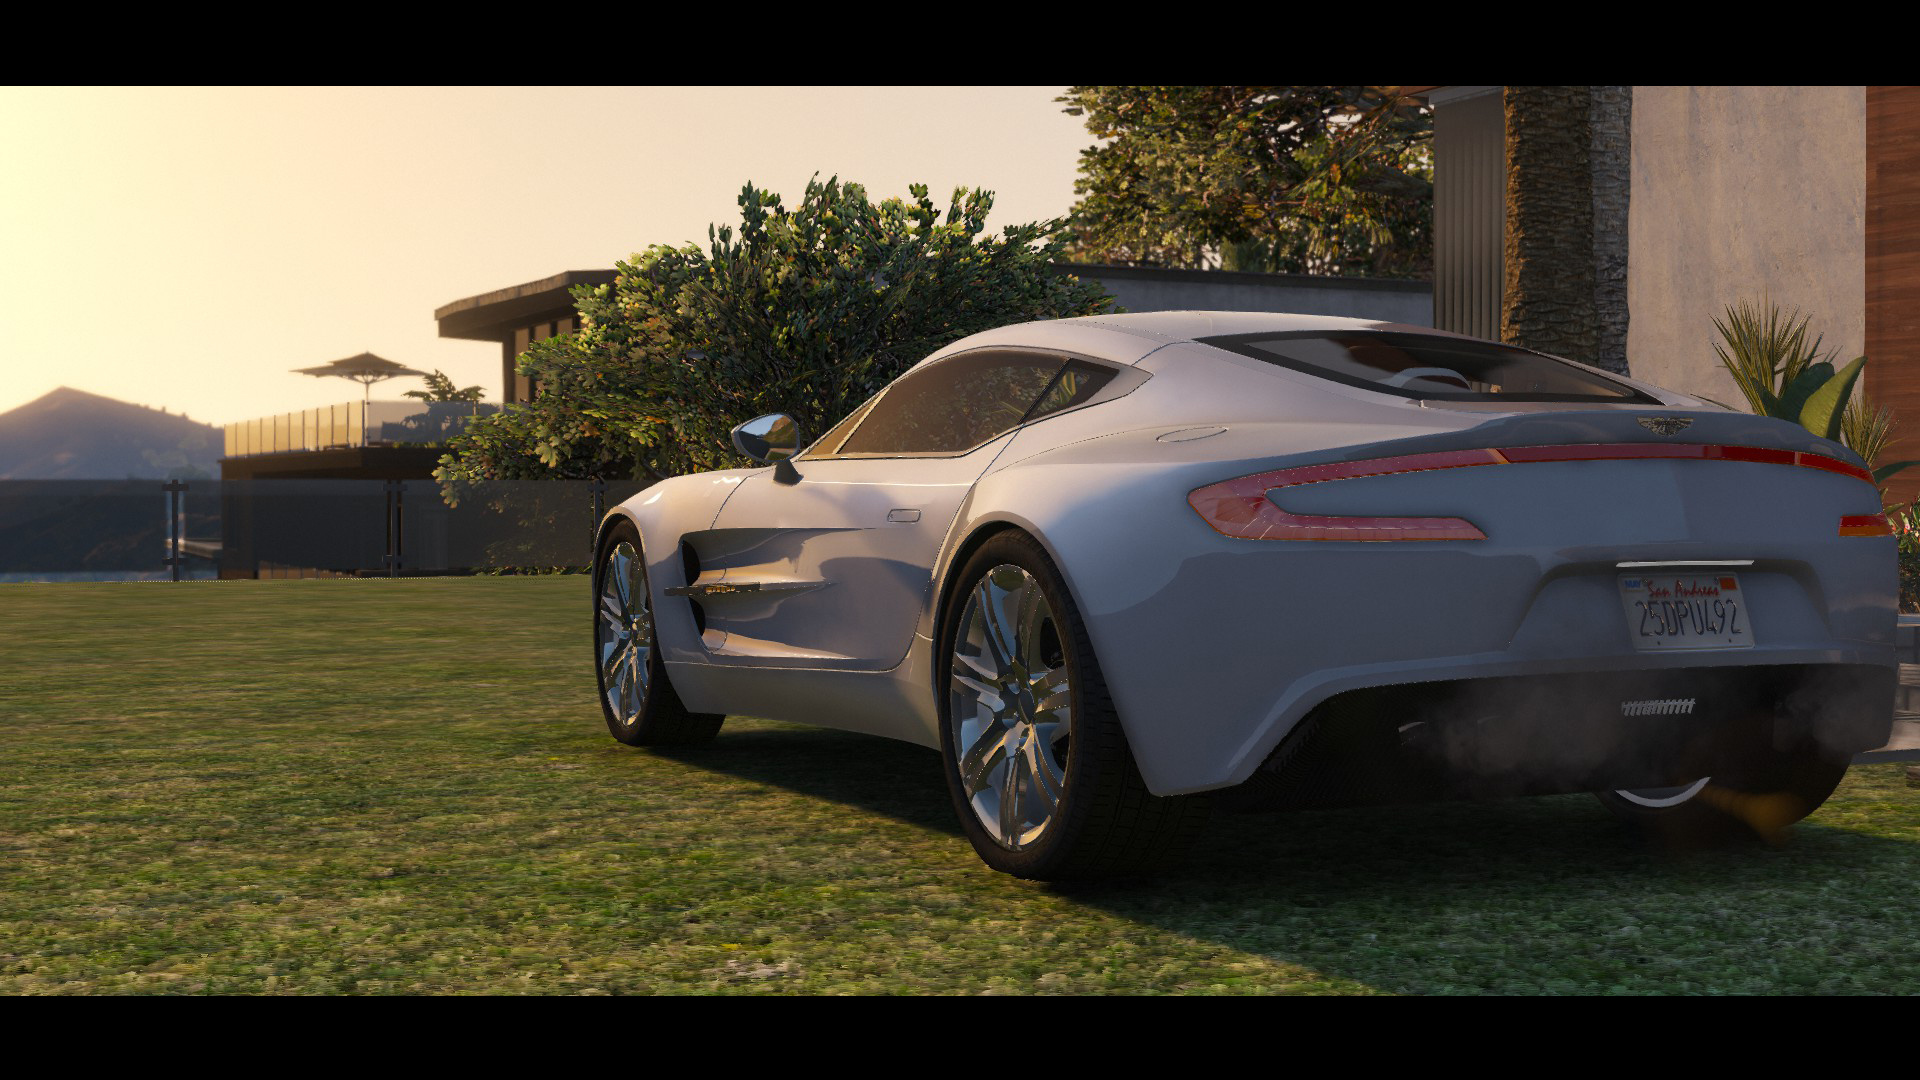 2012 Aston Martin One 77 Replace Tuning Auto Spoiler Lods Gta5 Mods Com